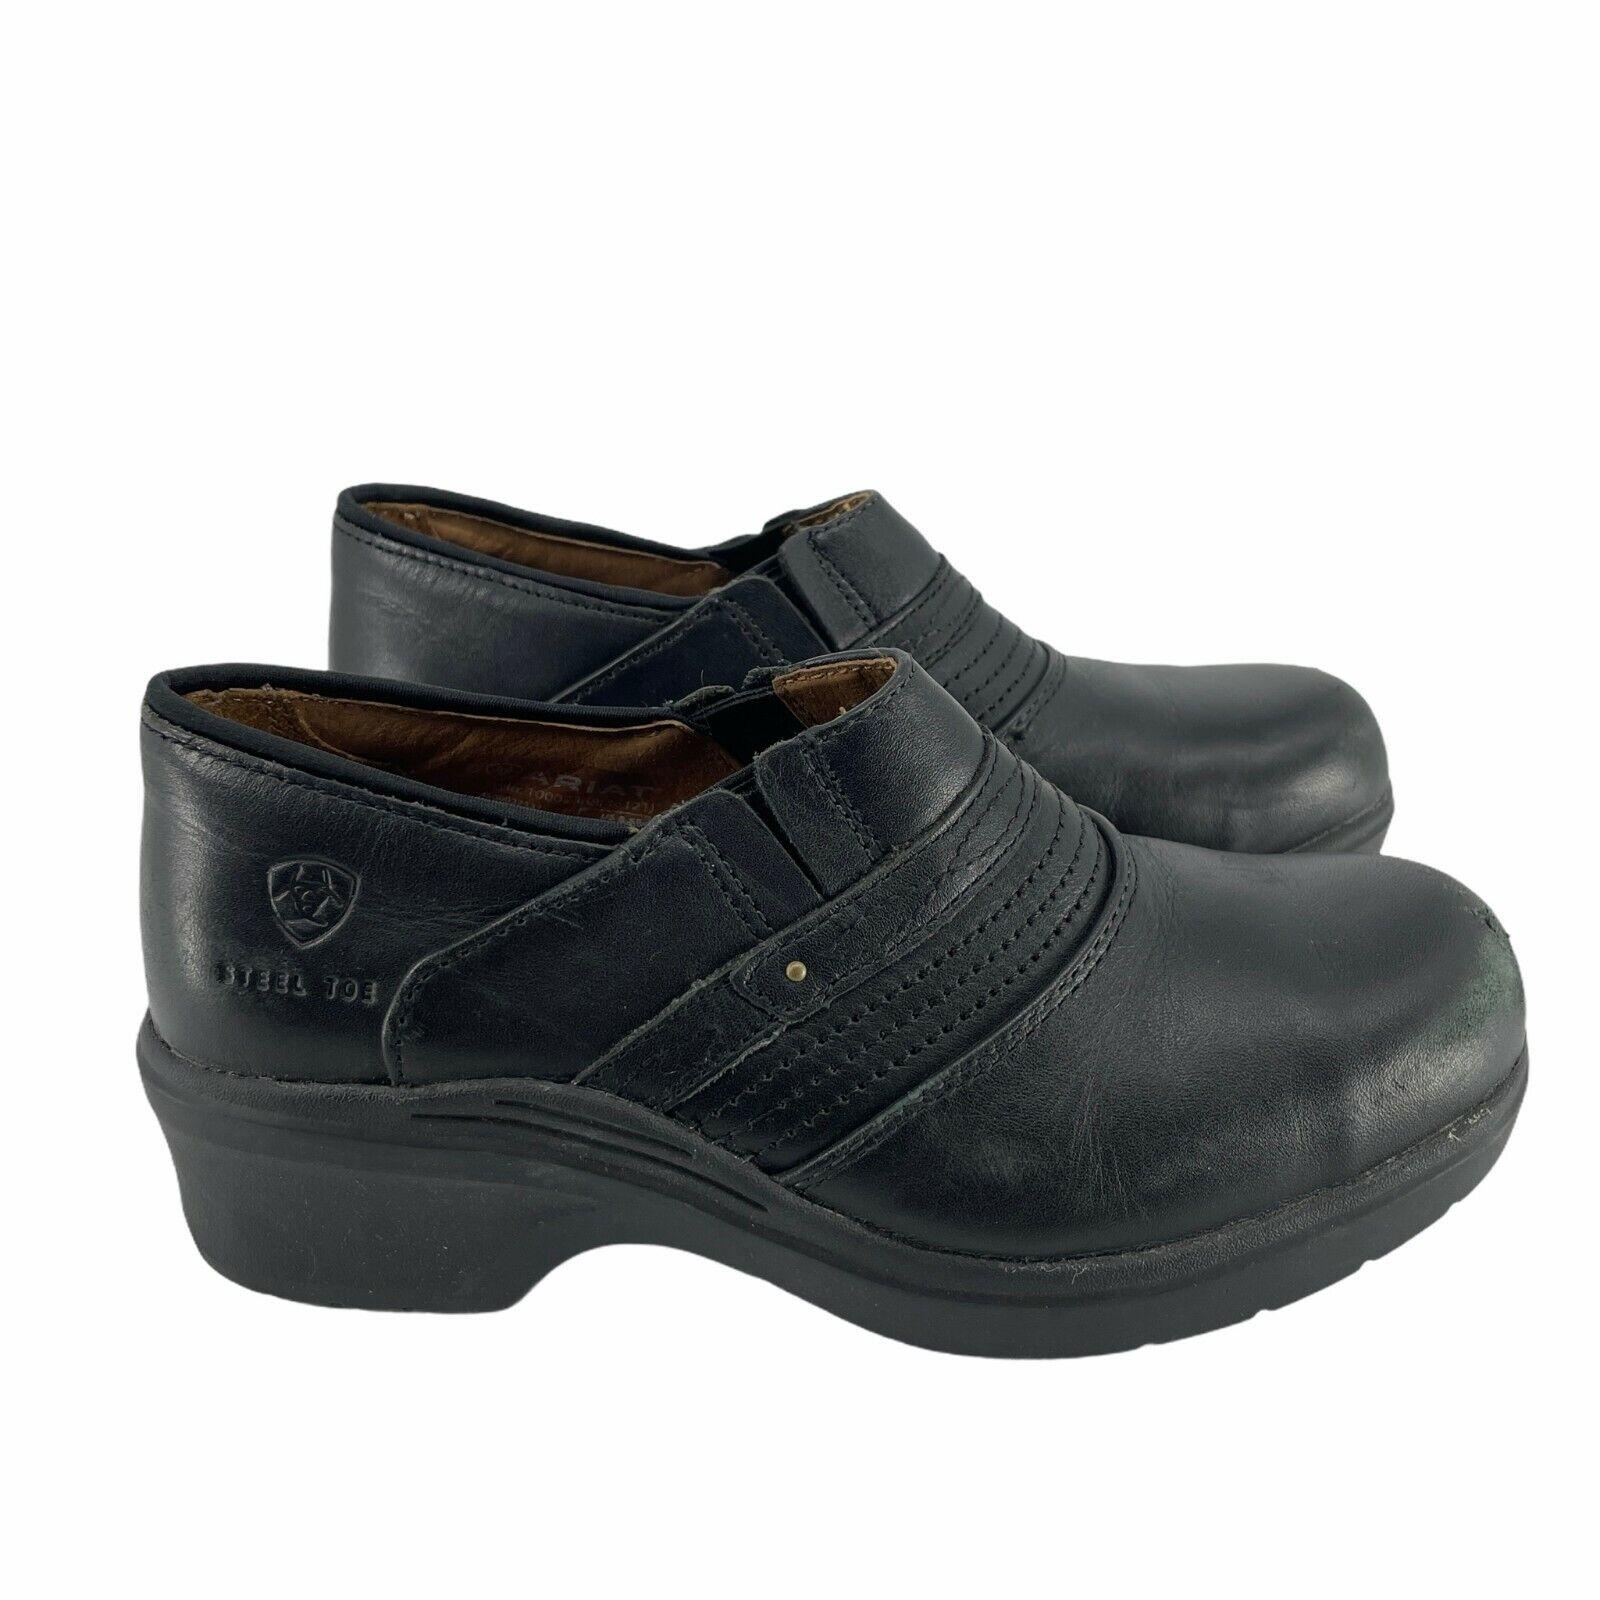 Ariat Women's Steel Toe Safety Clog Black Size 8.5B Full-Grain Leather